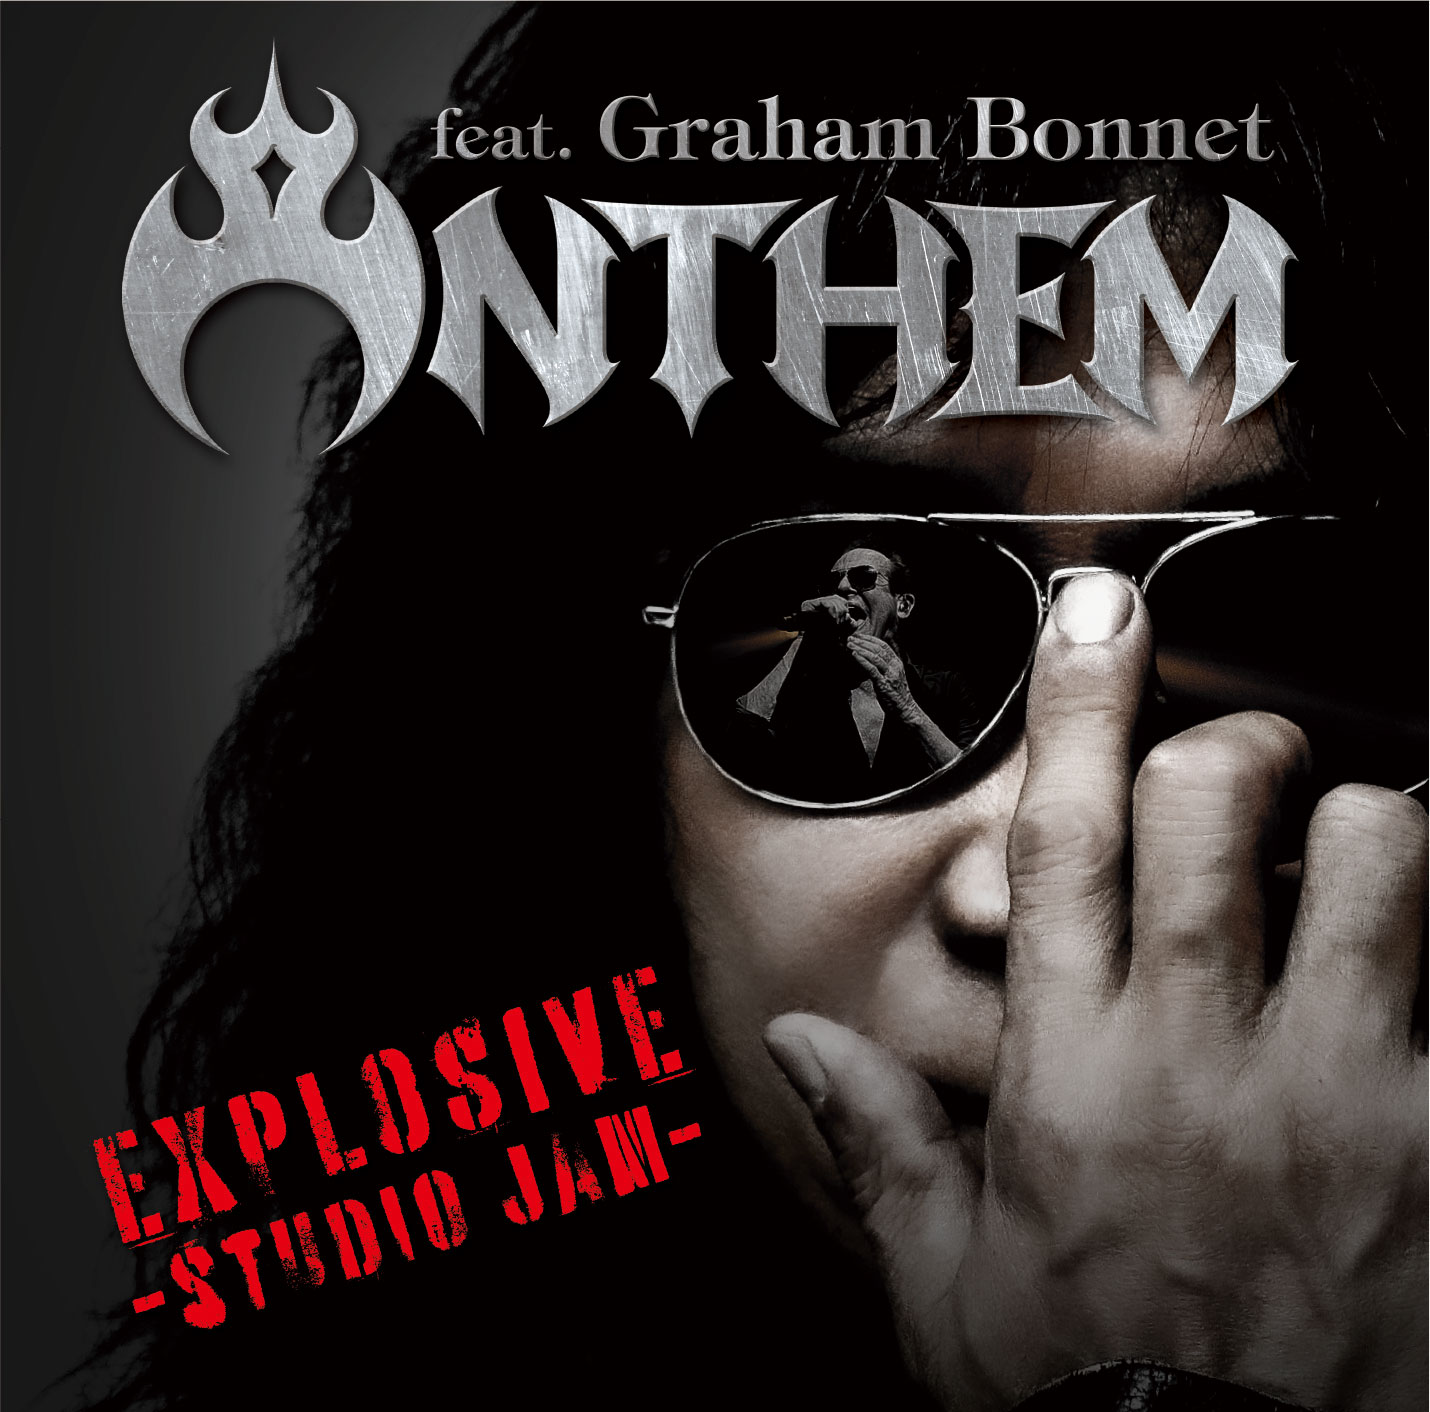 ANTHEM feat. Graham Bonnet / EXPLOSIVE!! -studio jam-